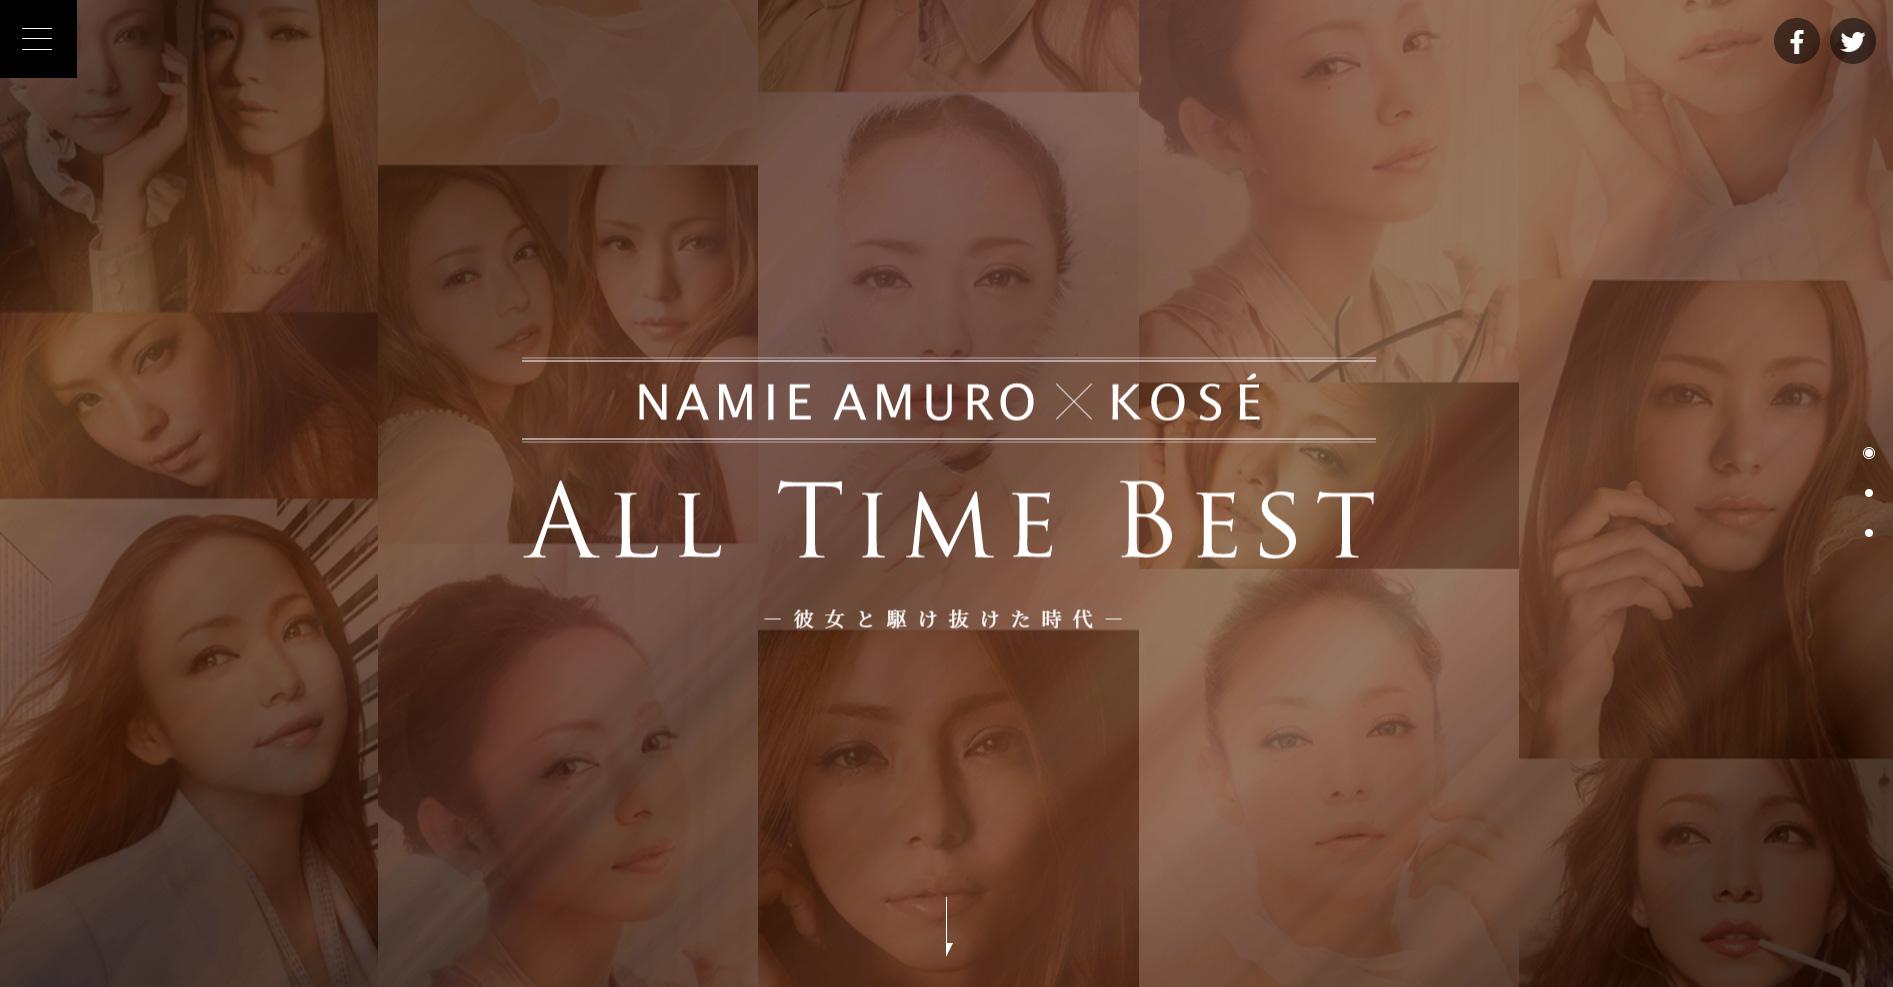 NAMIE AMURO×KOSÉ ALL TIME BESTサイト内 『彼女と駆け抜けた時代』